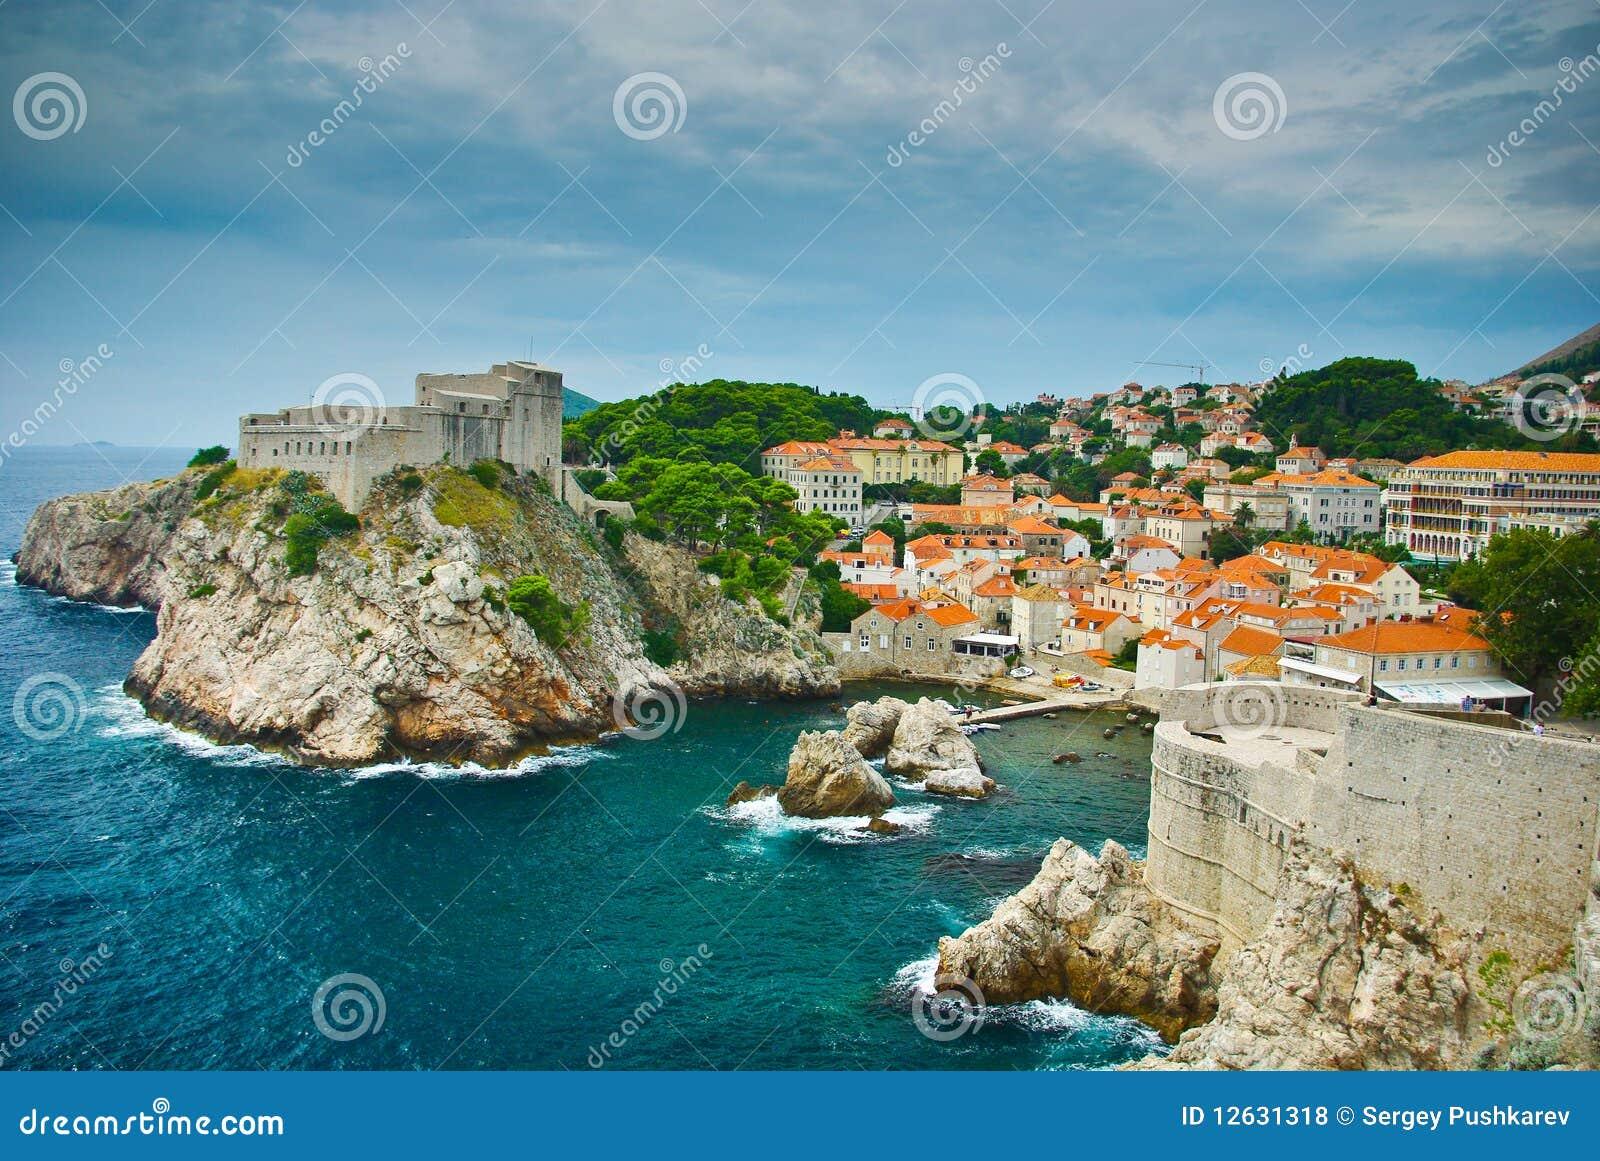 Dubrovnik-Festung